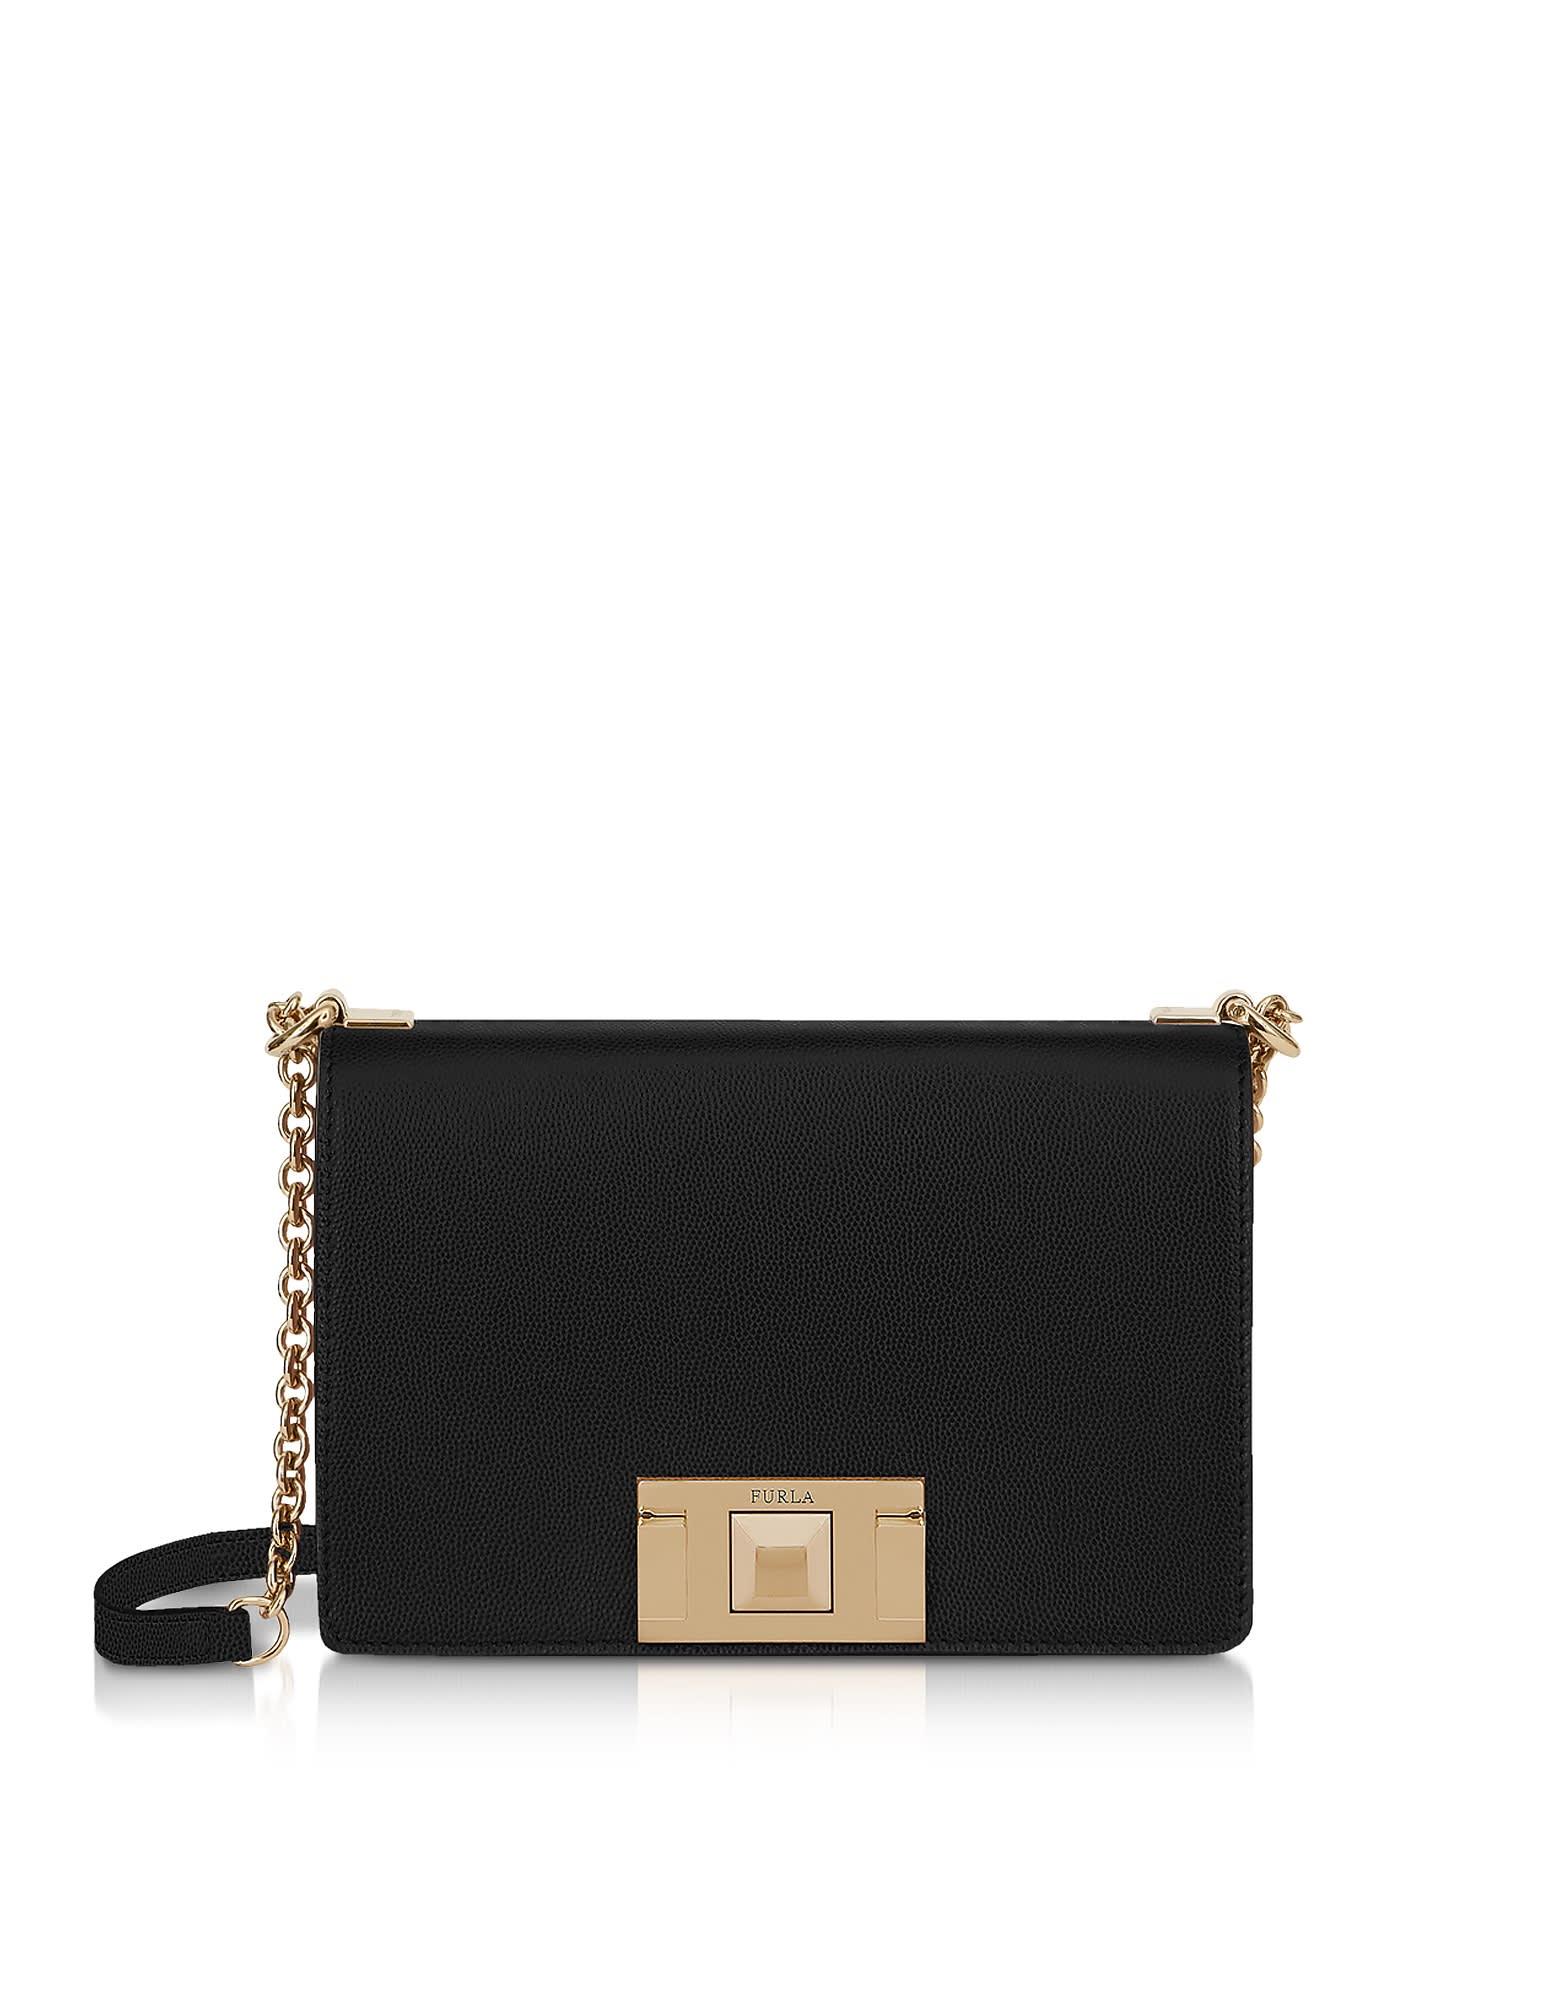 Furla Black Leather Mimì Mini Crossbody Bag